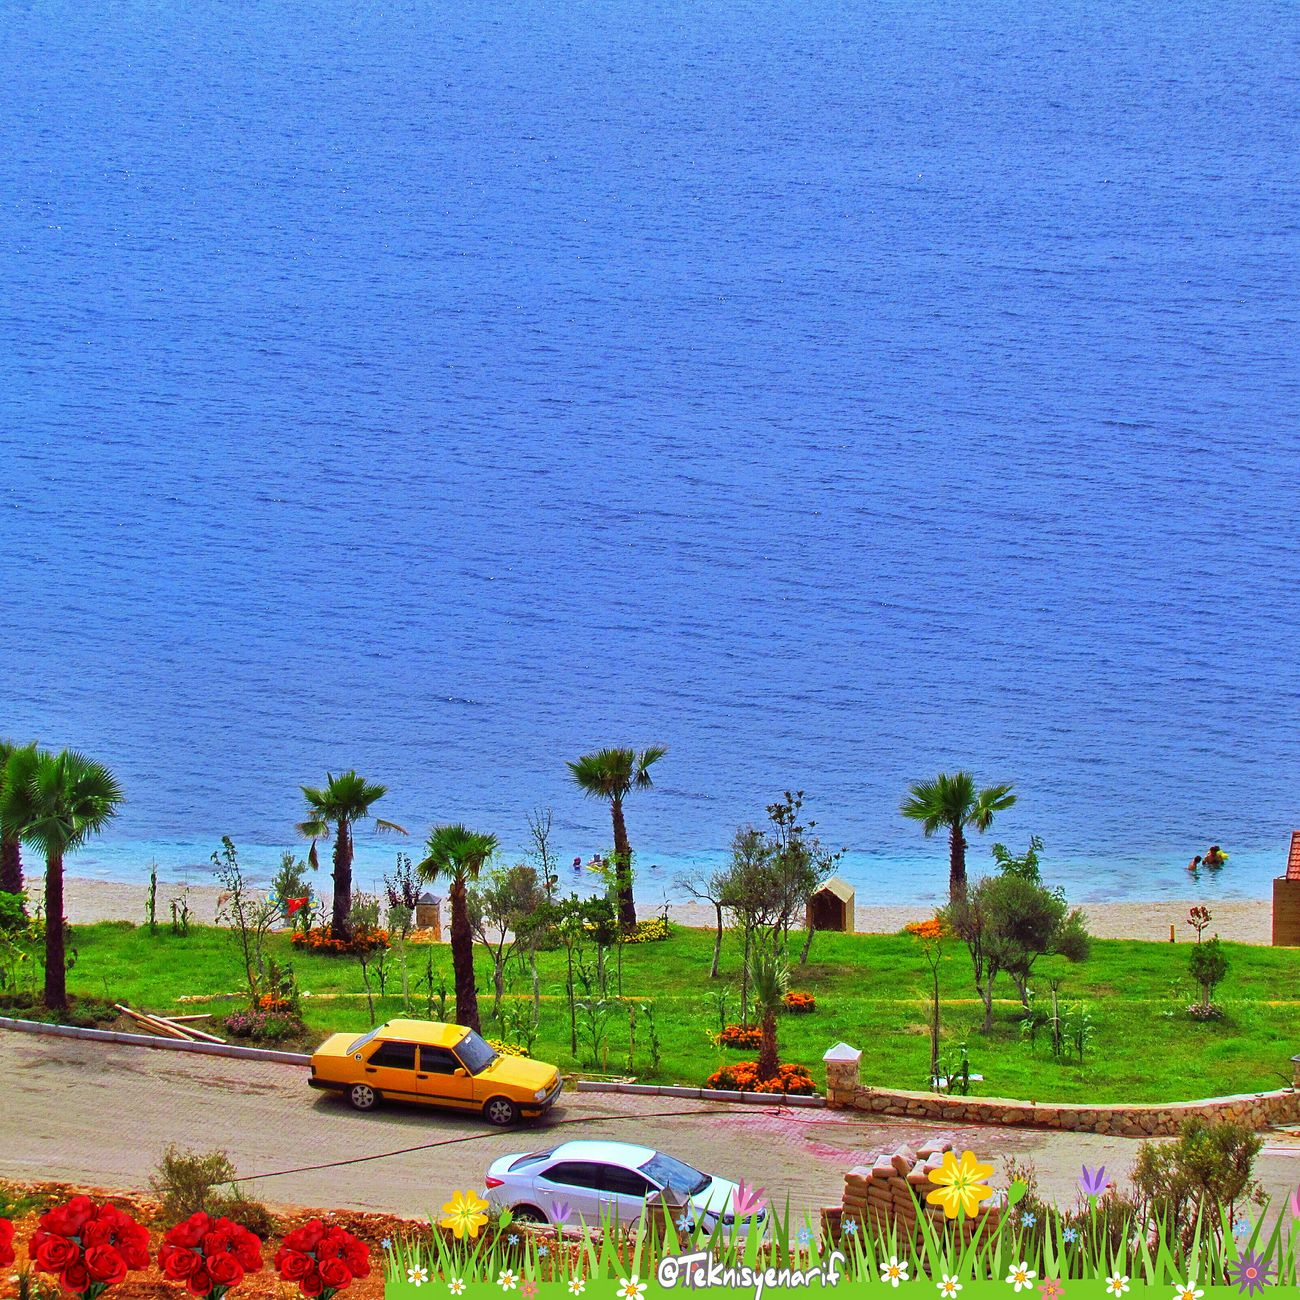 Kaş Çukurbağ peninsula new beach Çukurbağ Yarımadası Peninsula Kas New Beach Yeni Plaj